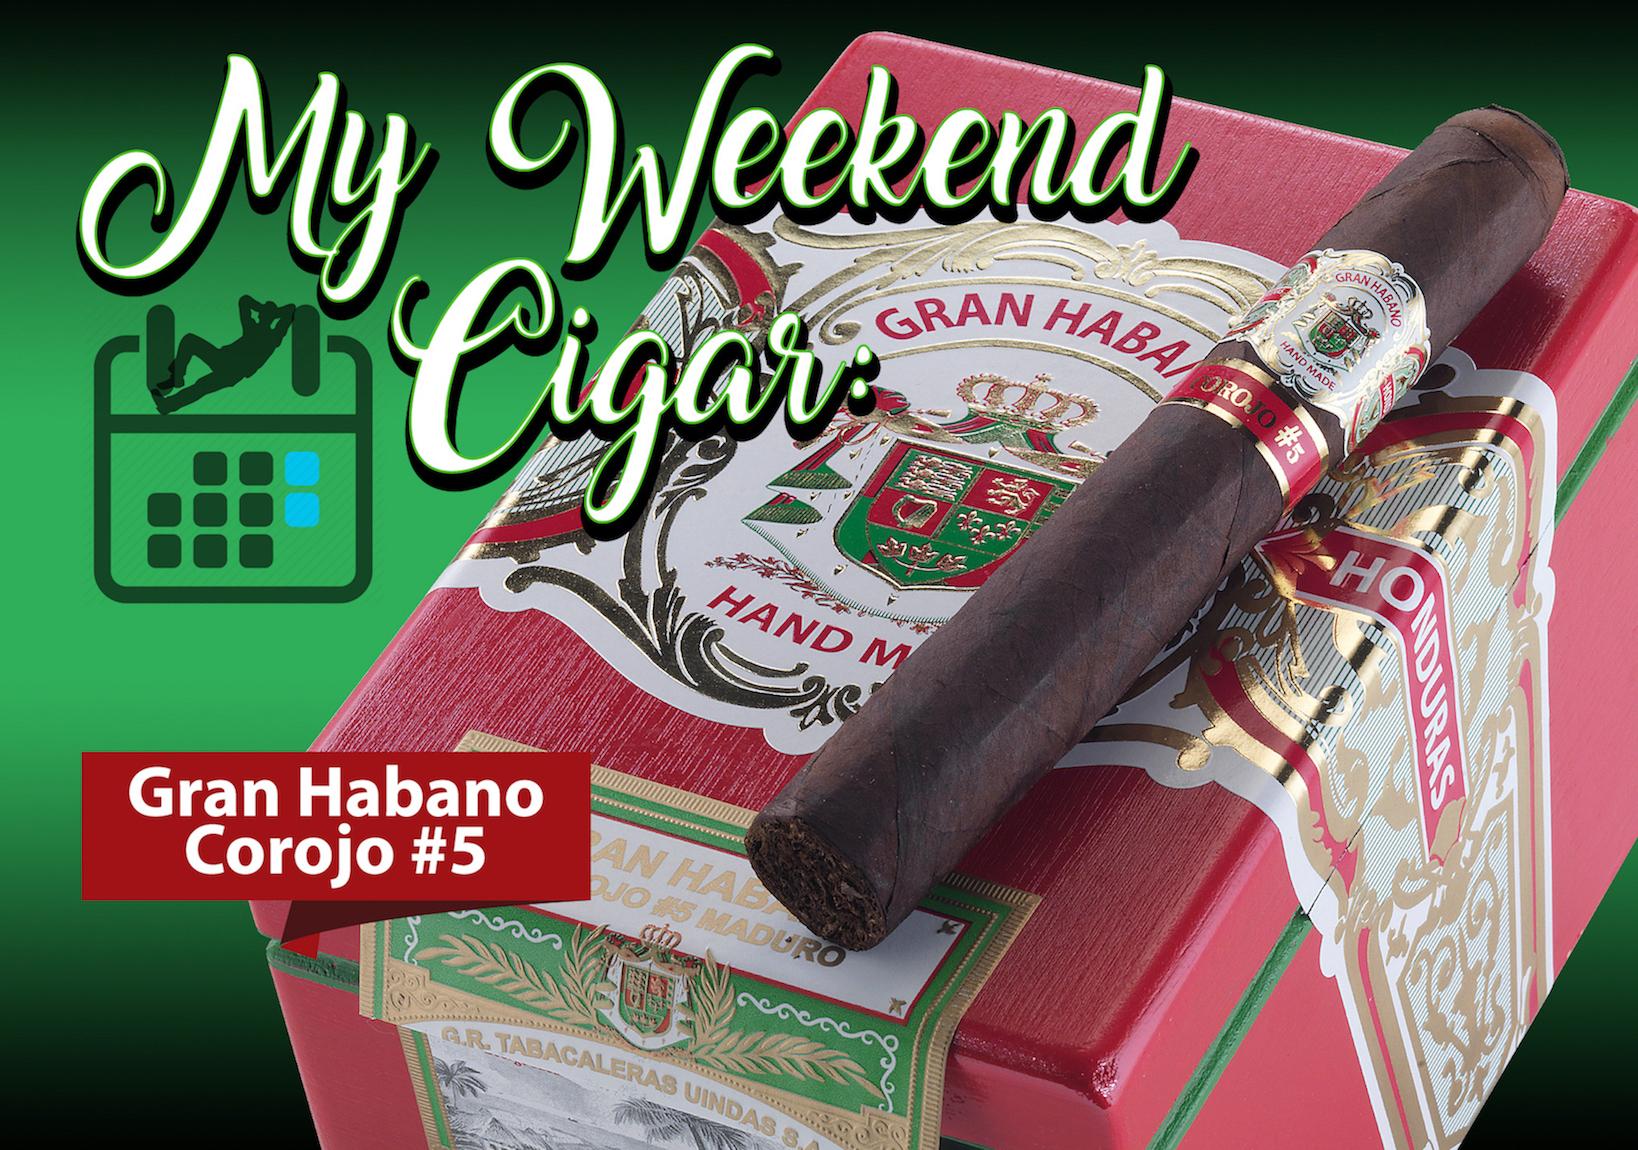 My Weekend Cigar: Jan. 29, 2018 – Gran Habano #5 Corojo Gran Robusto